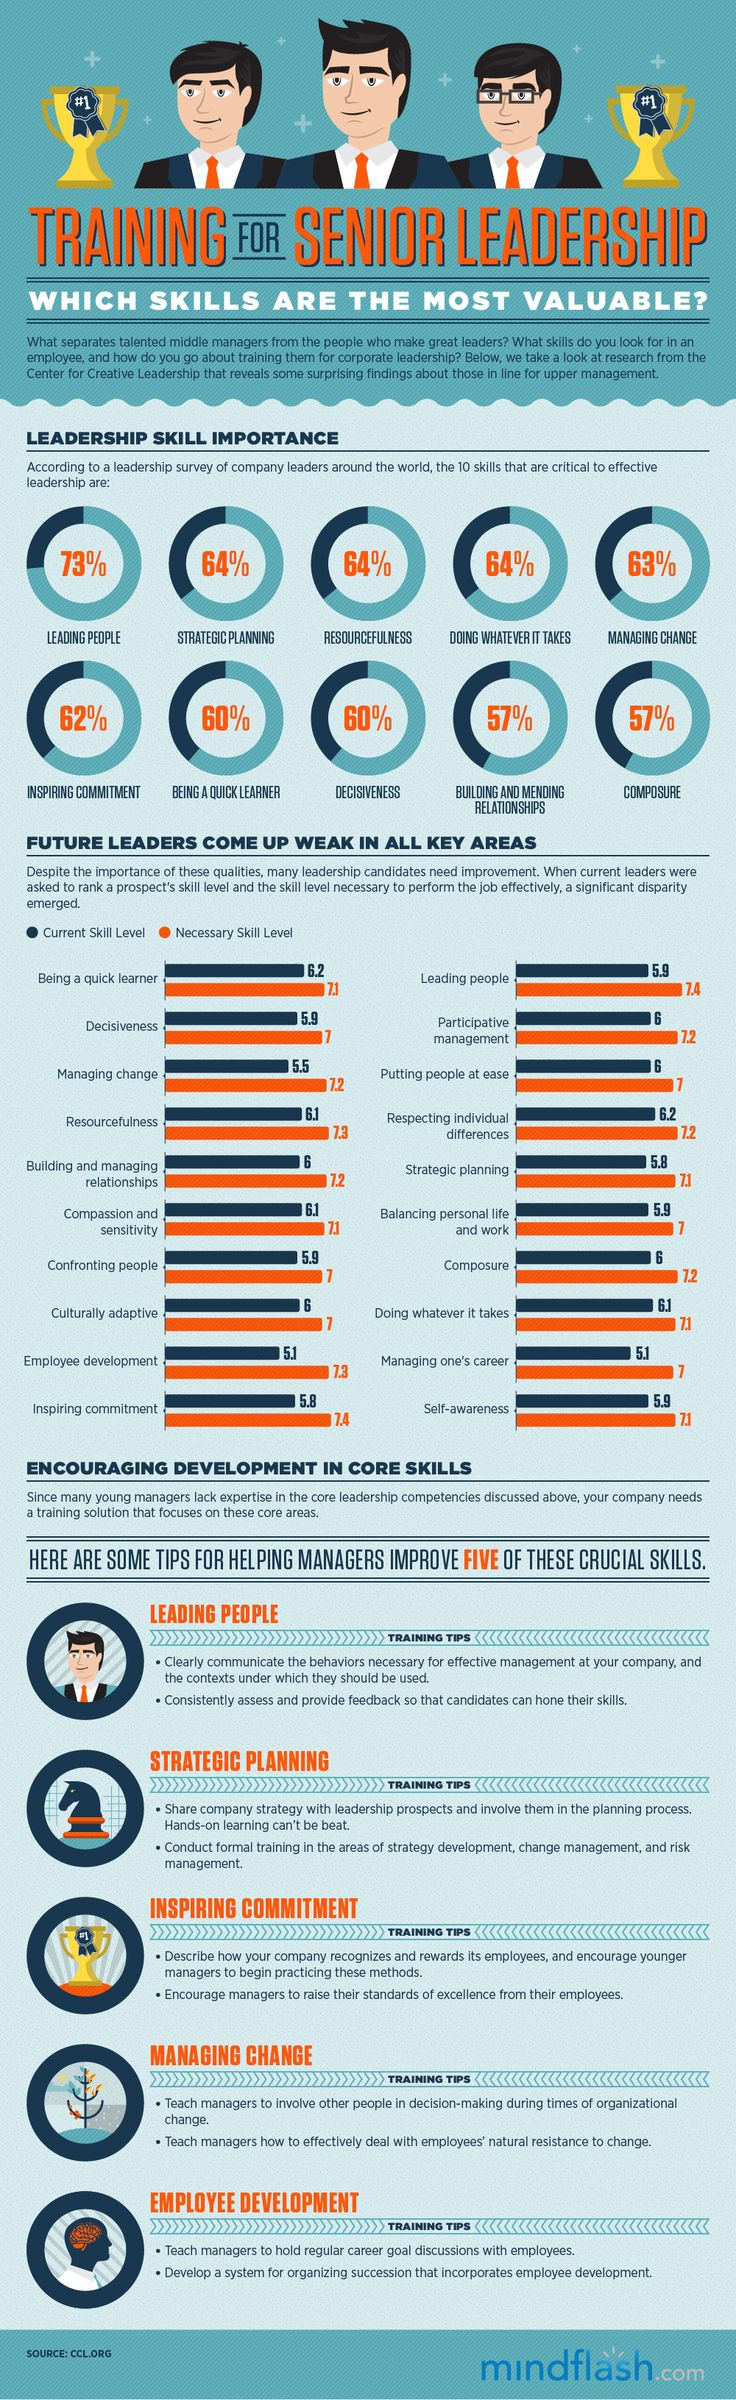 Leadership skills and competencies pdf